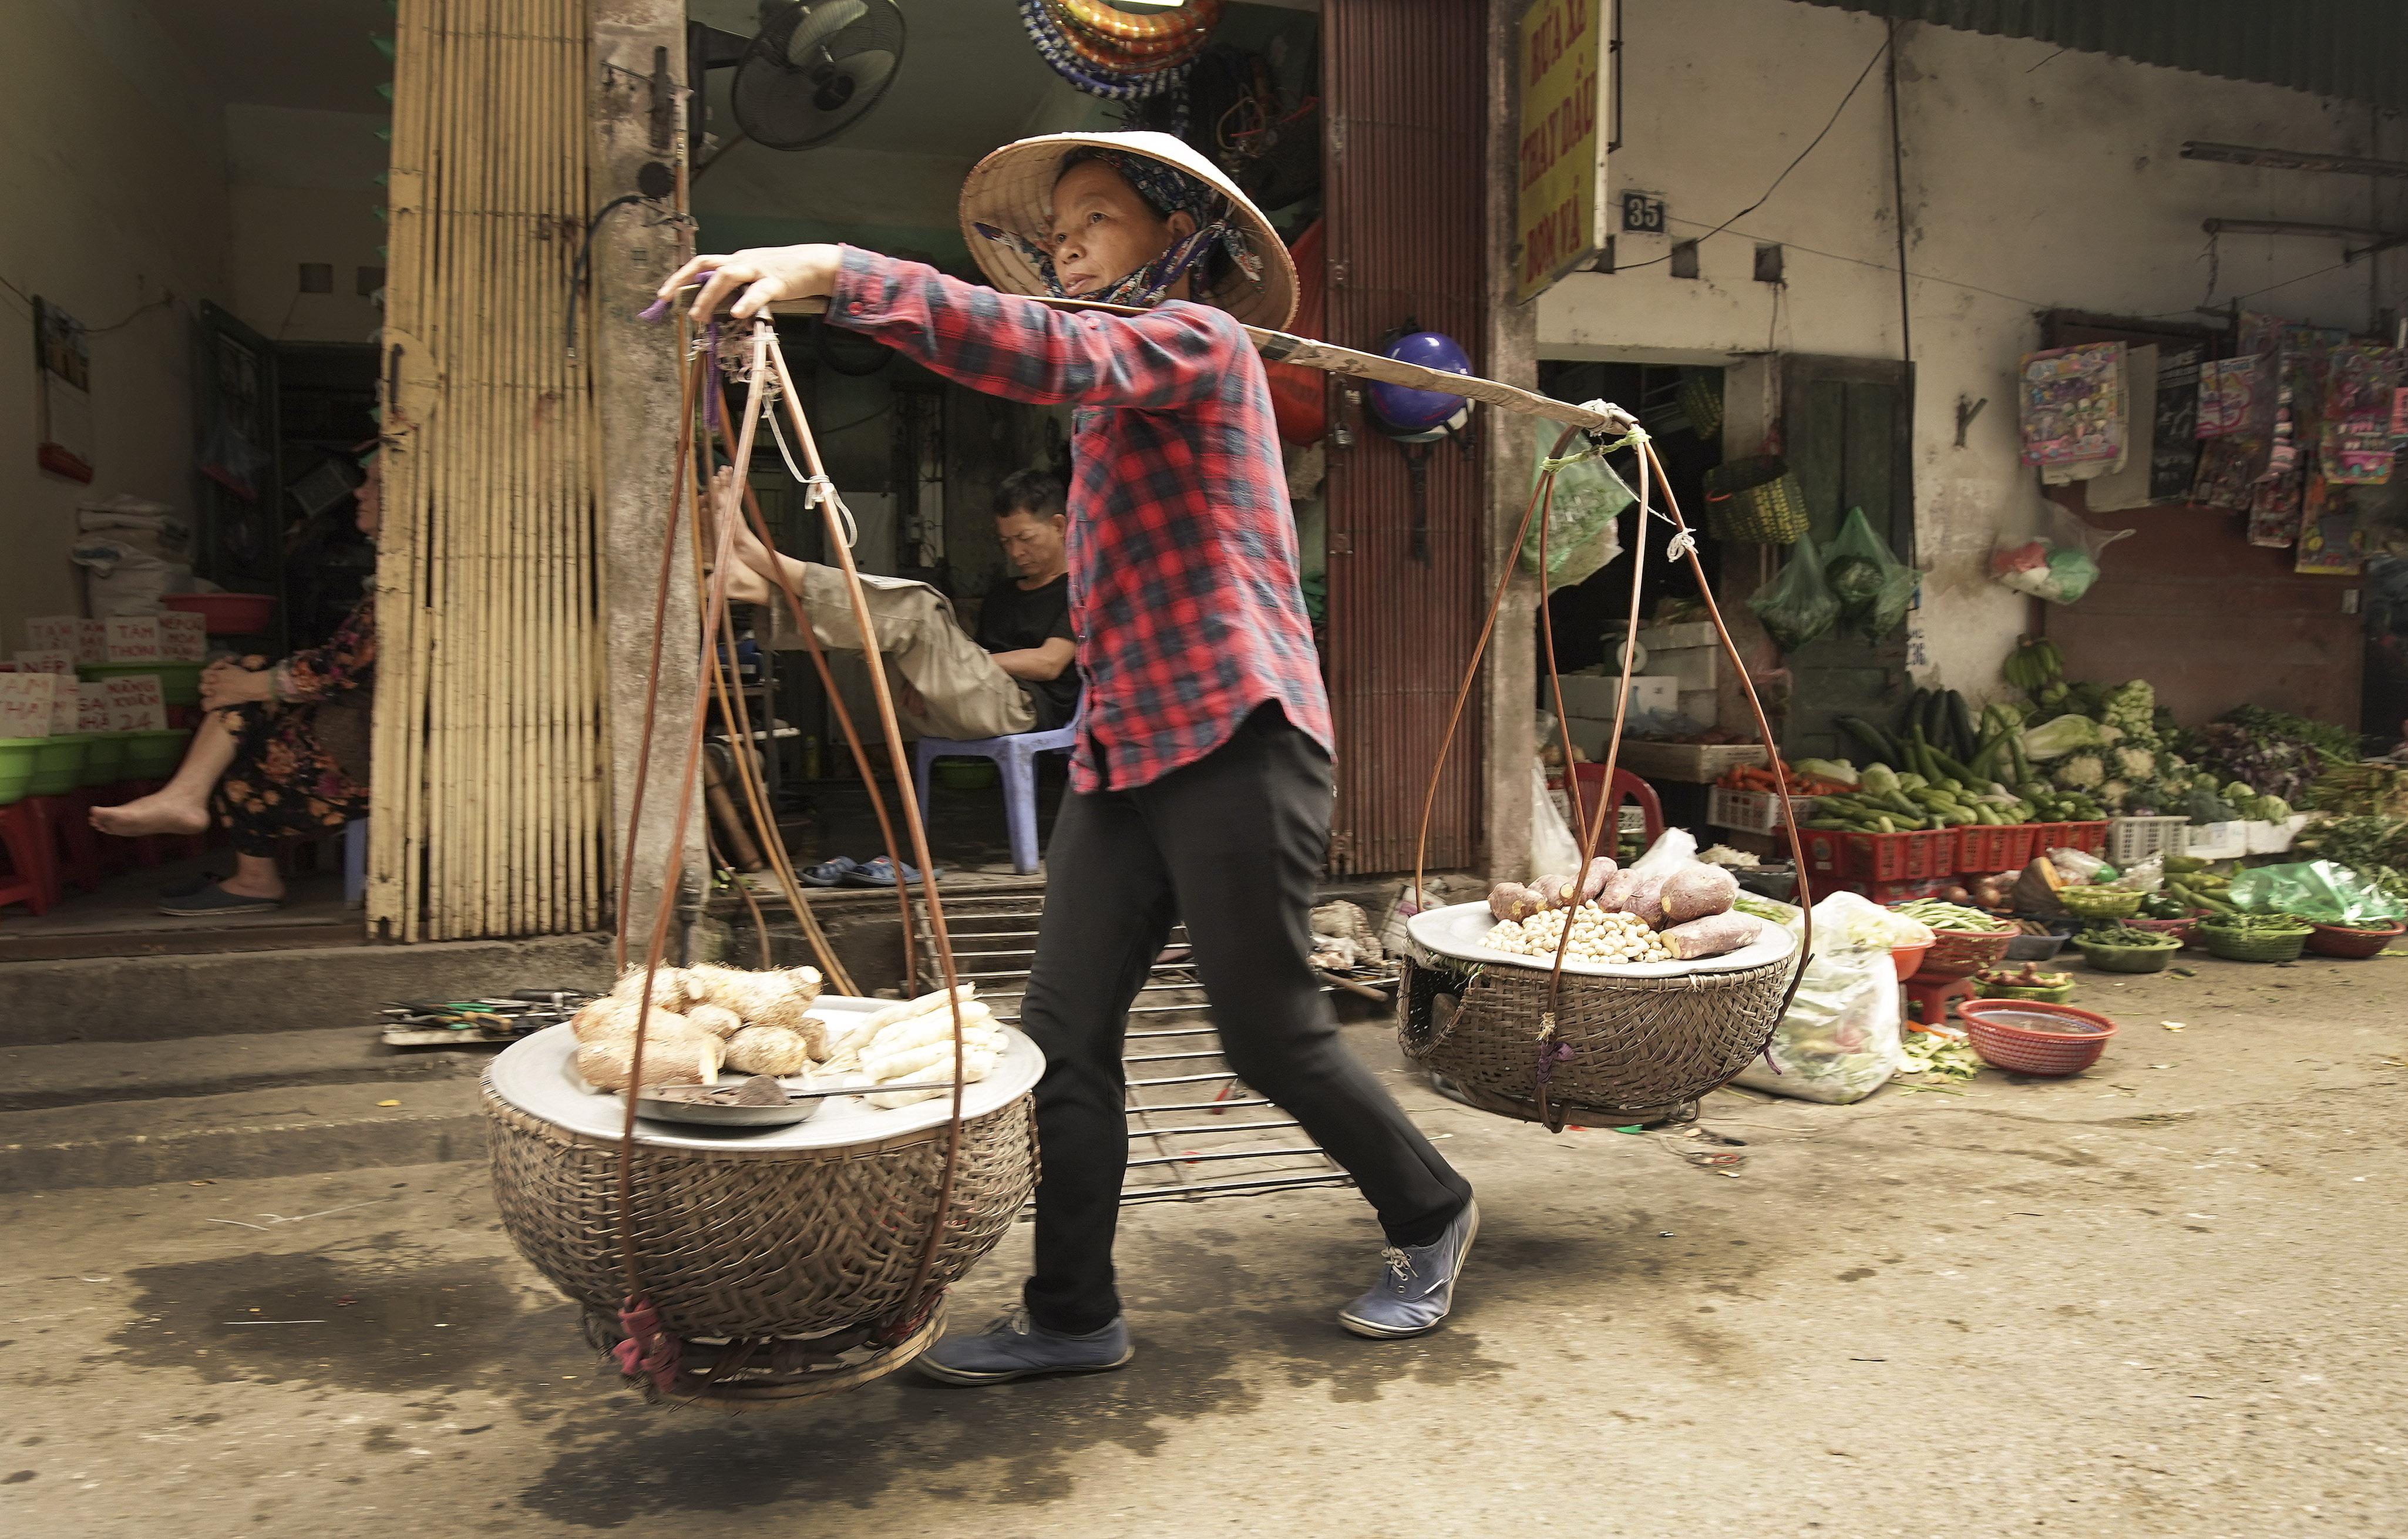 A woman sells produce in Hanoi, Vietnam on Saturday, Nov. 16, 2019.